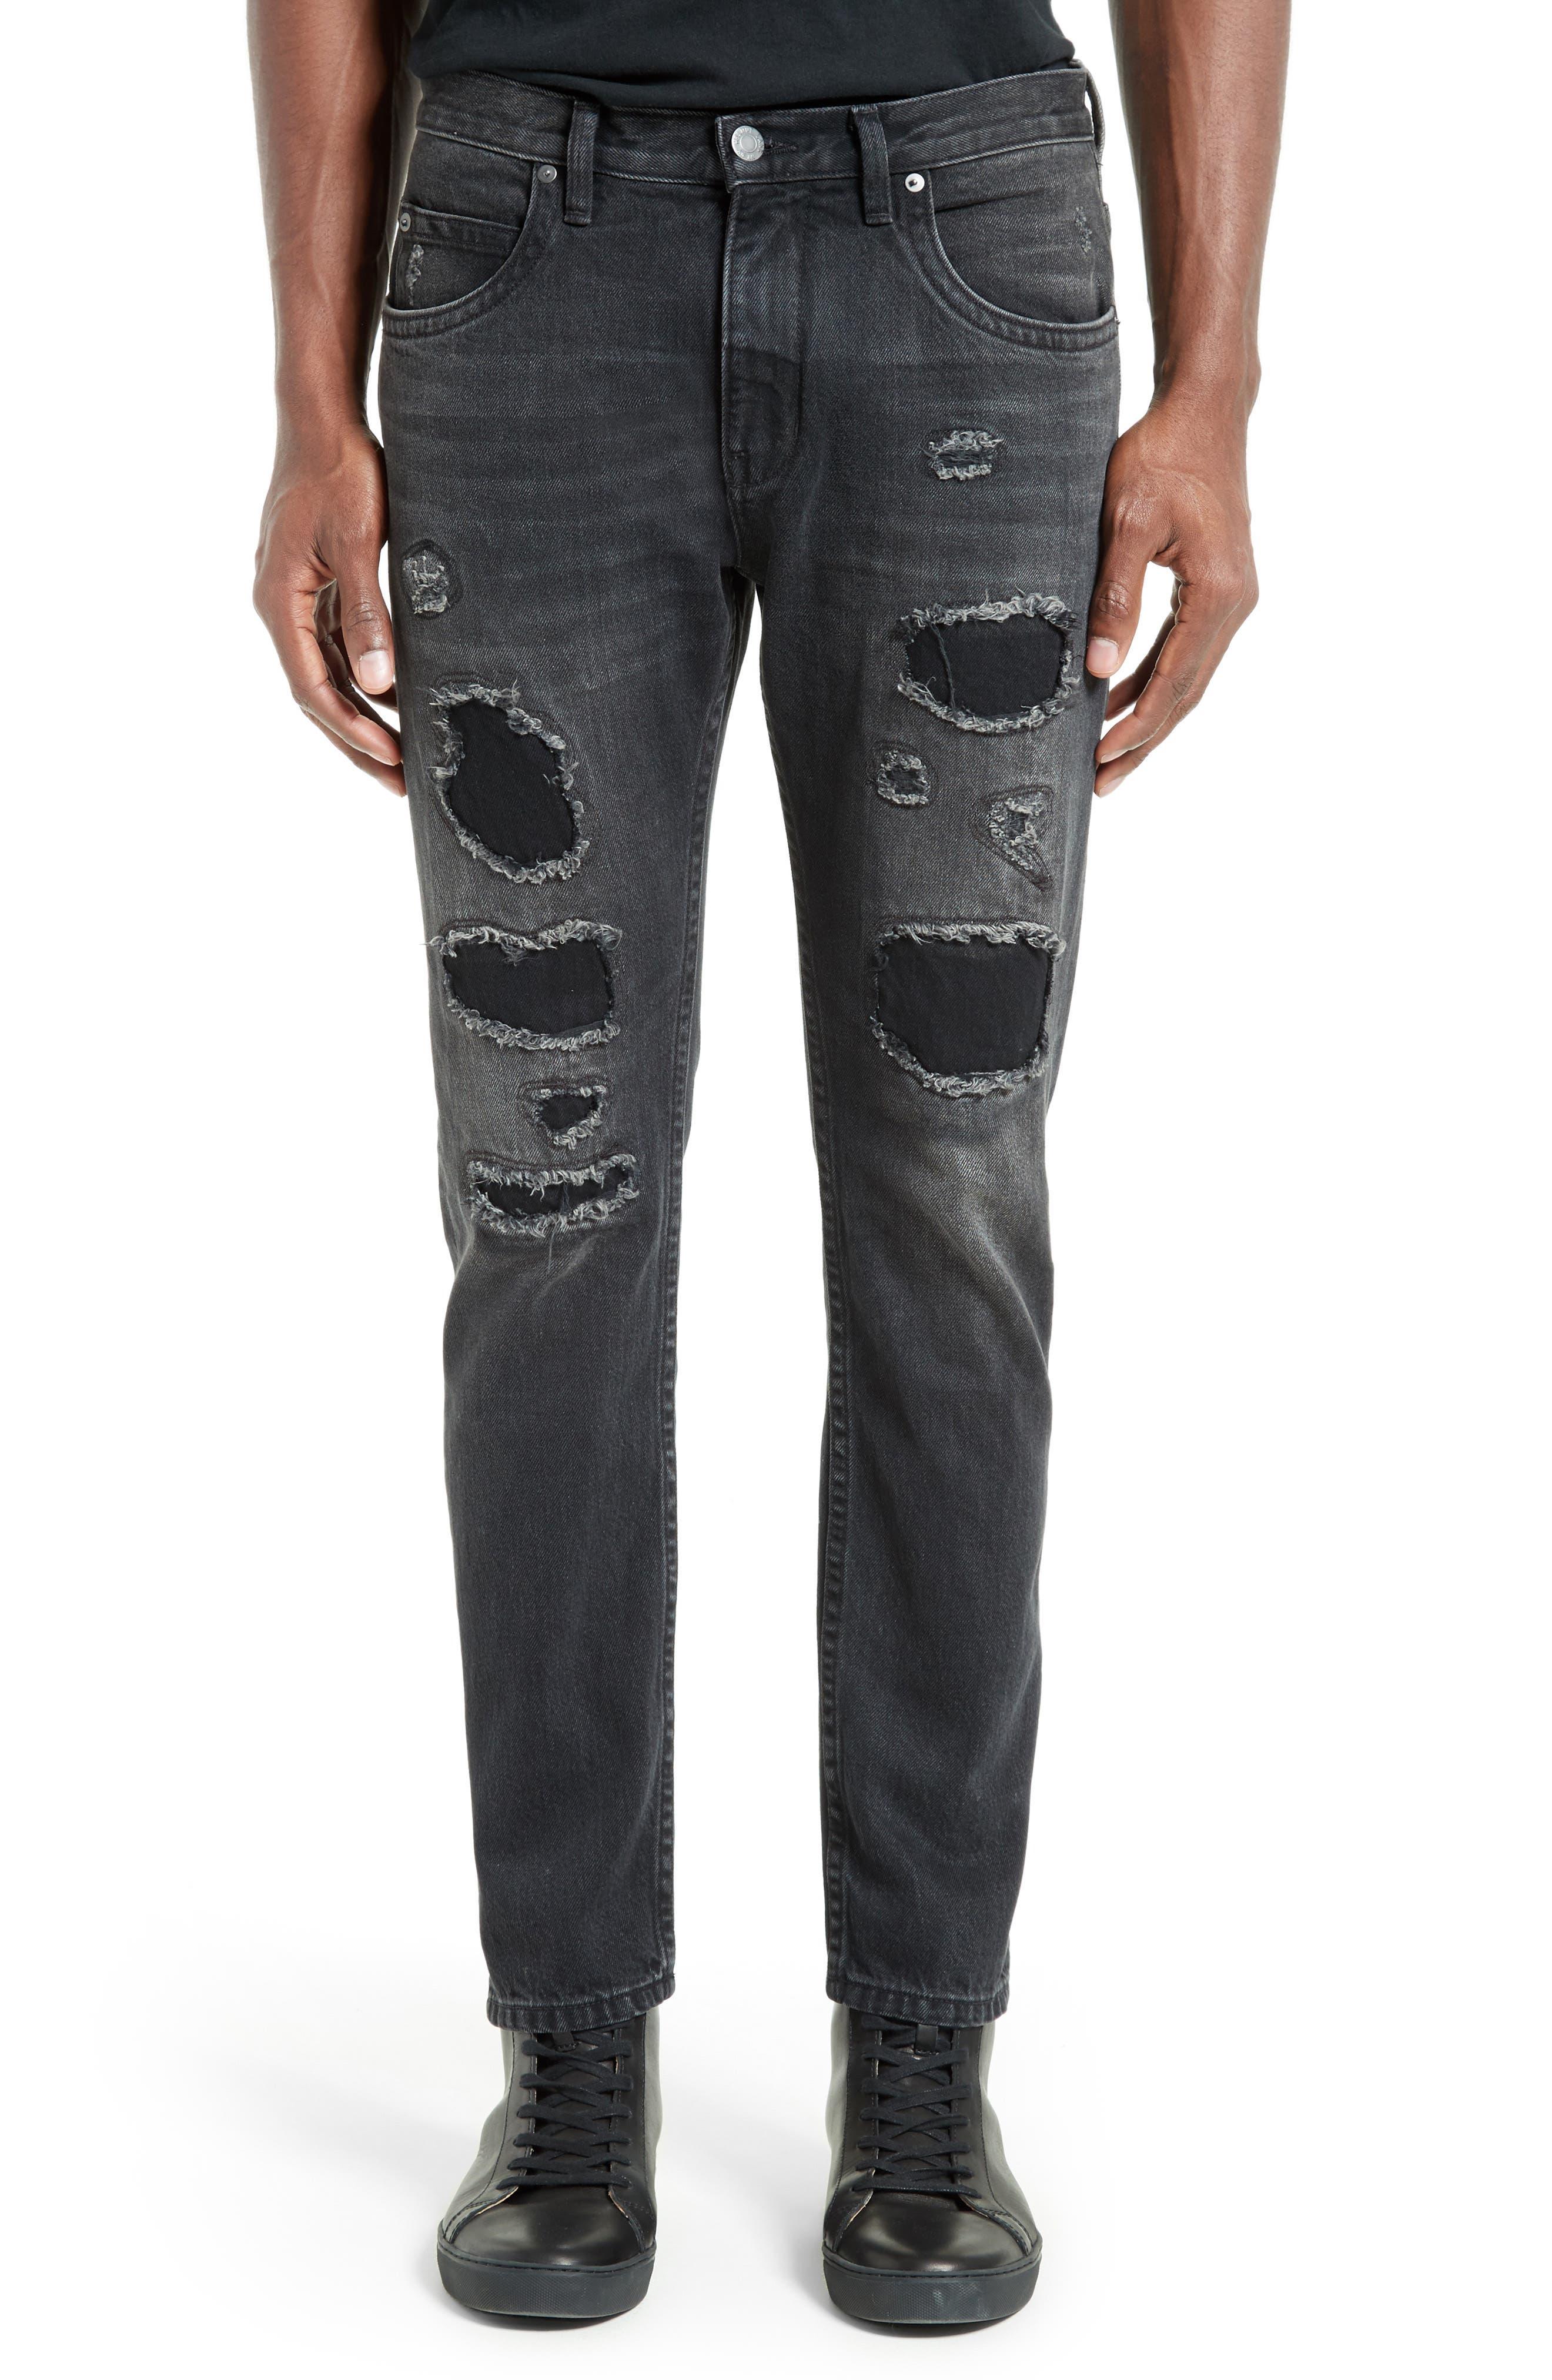 MR87 Destroyed Jeans,                             Main thumbnail 1, color,                             Black